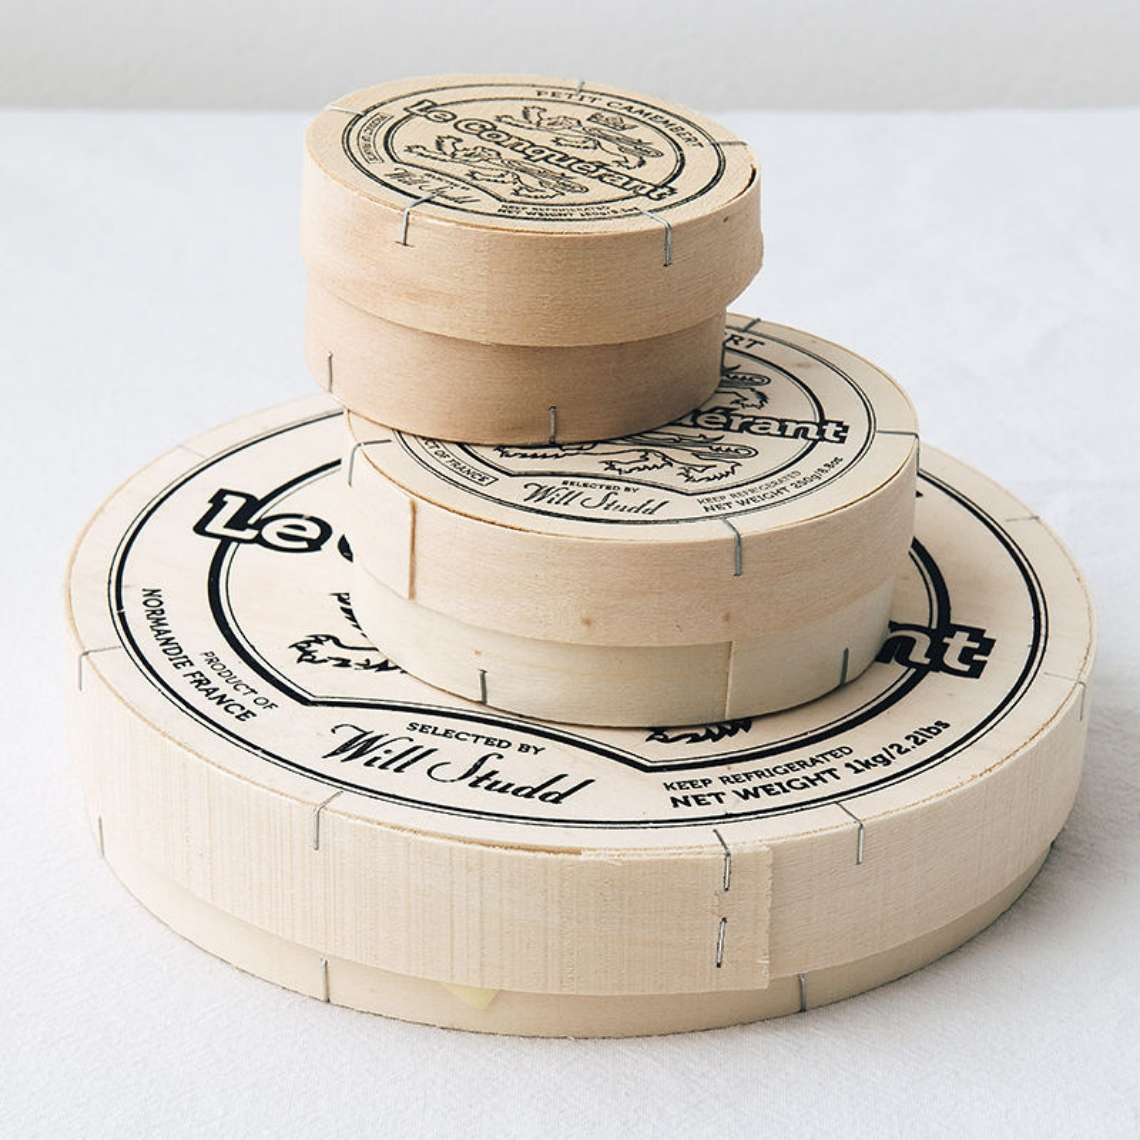 Le Conquérant Camembert